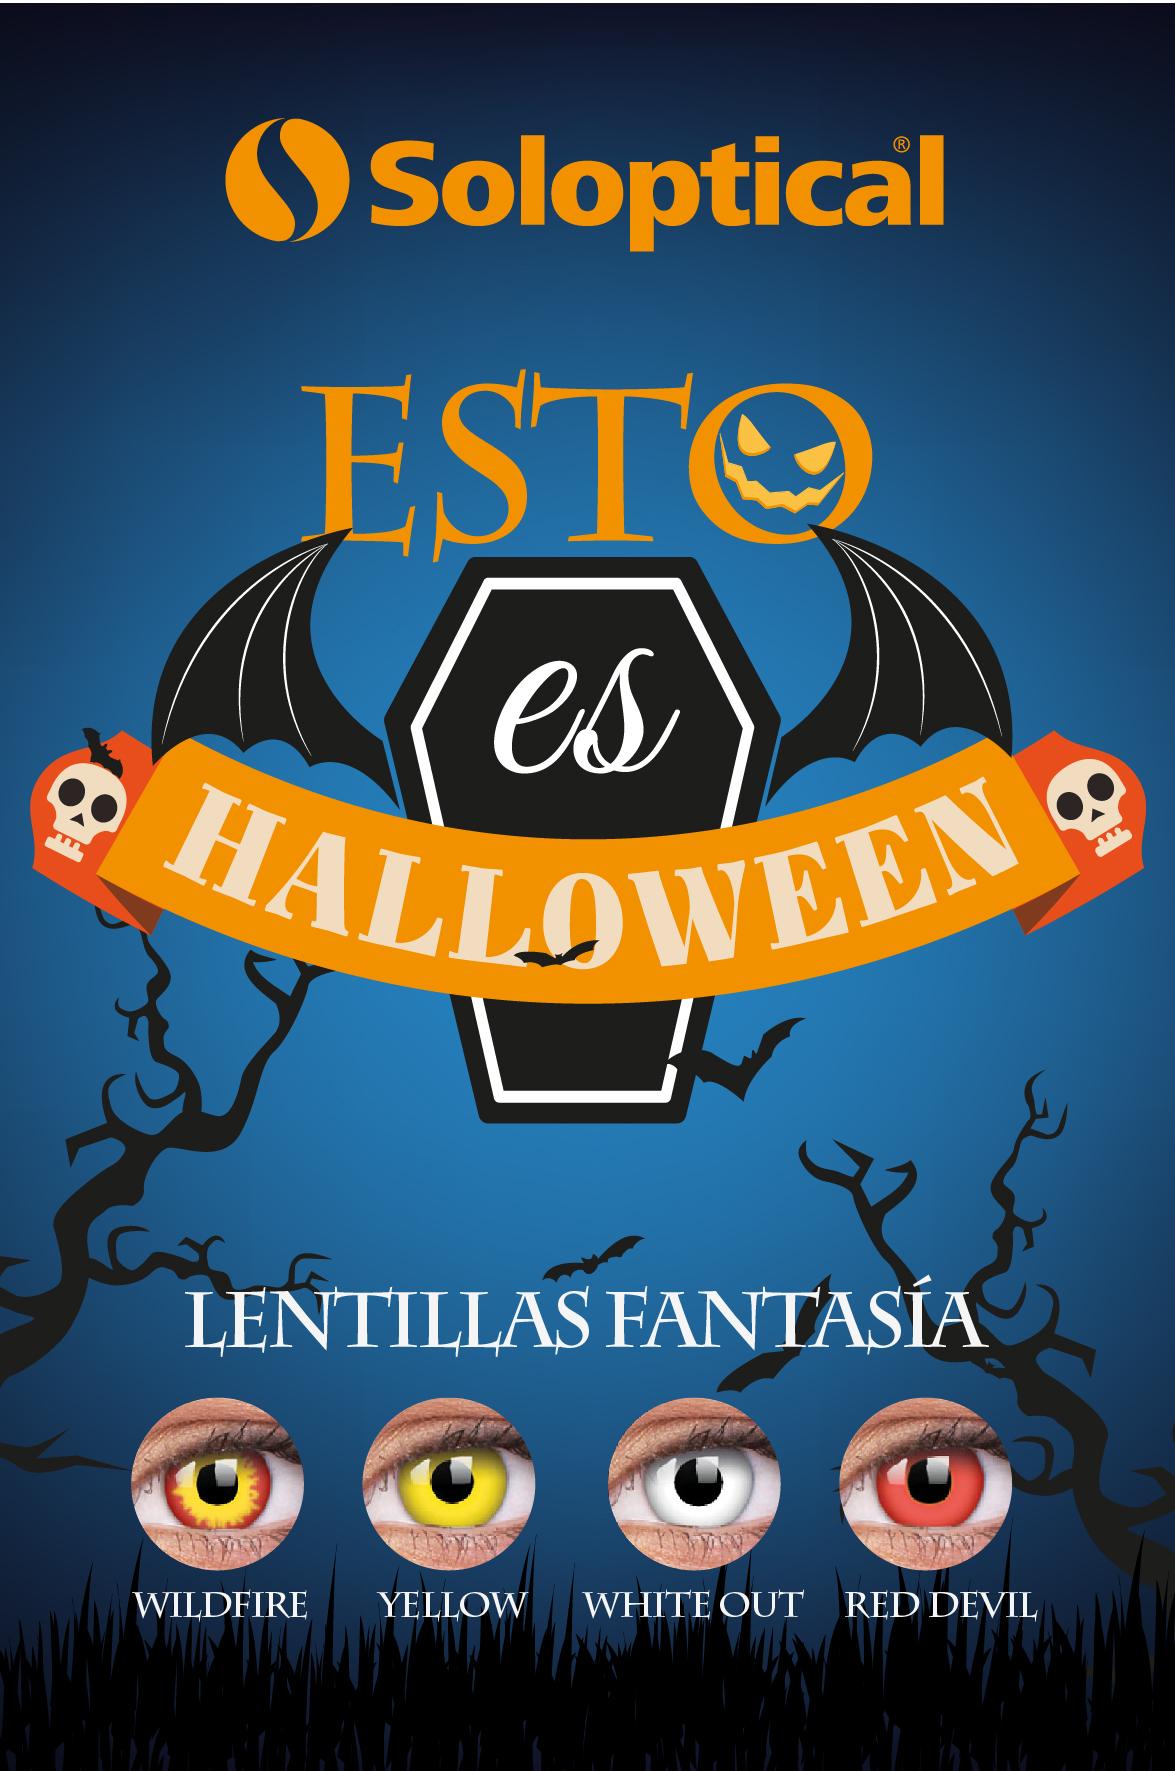 Lentillas de miedo para disfraz de Halloween